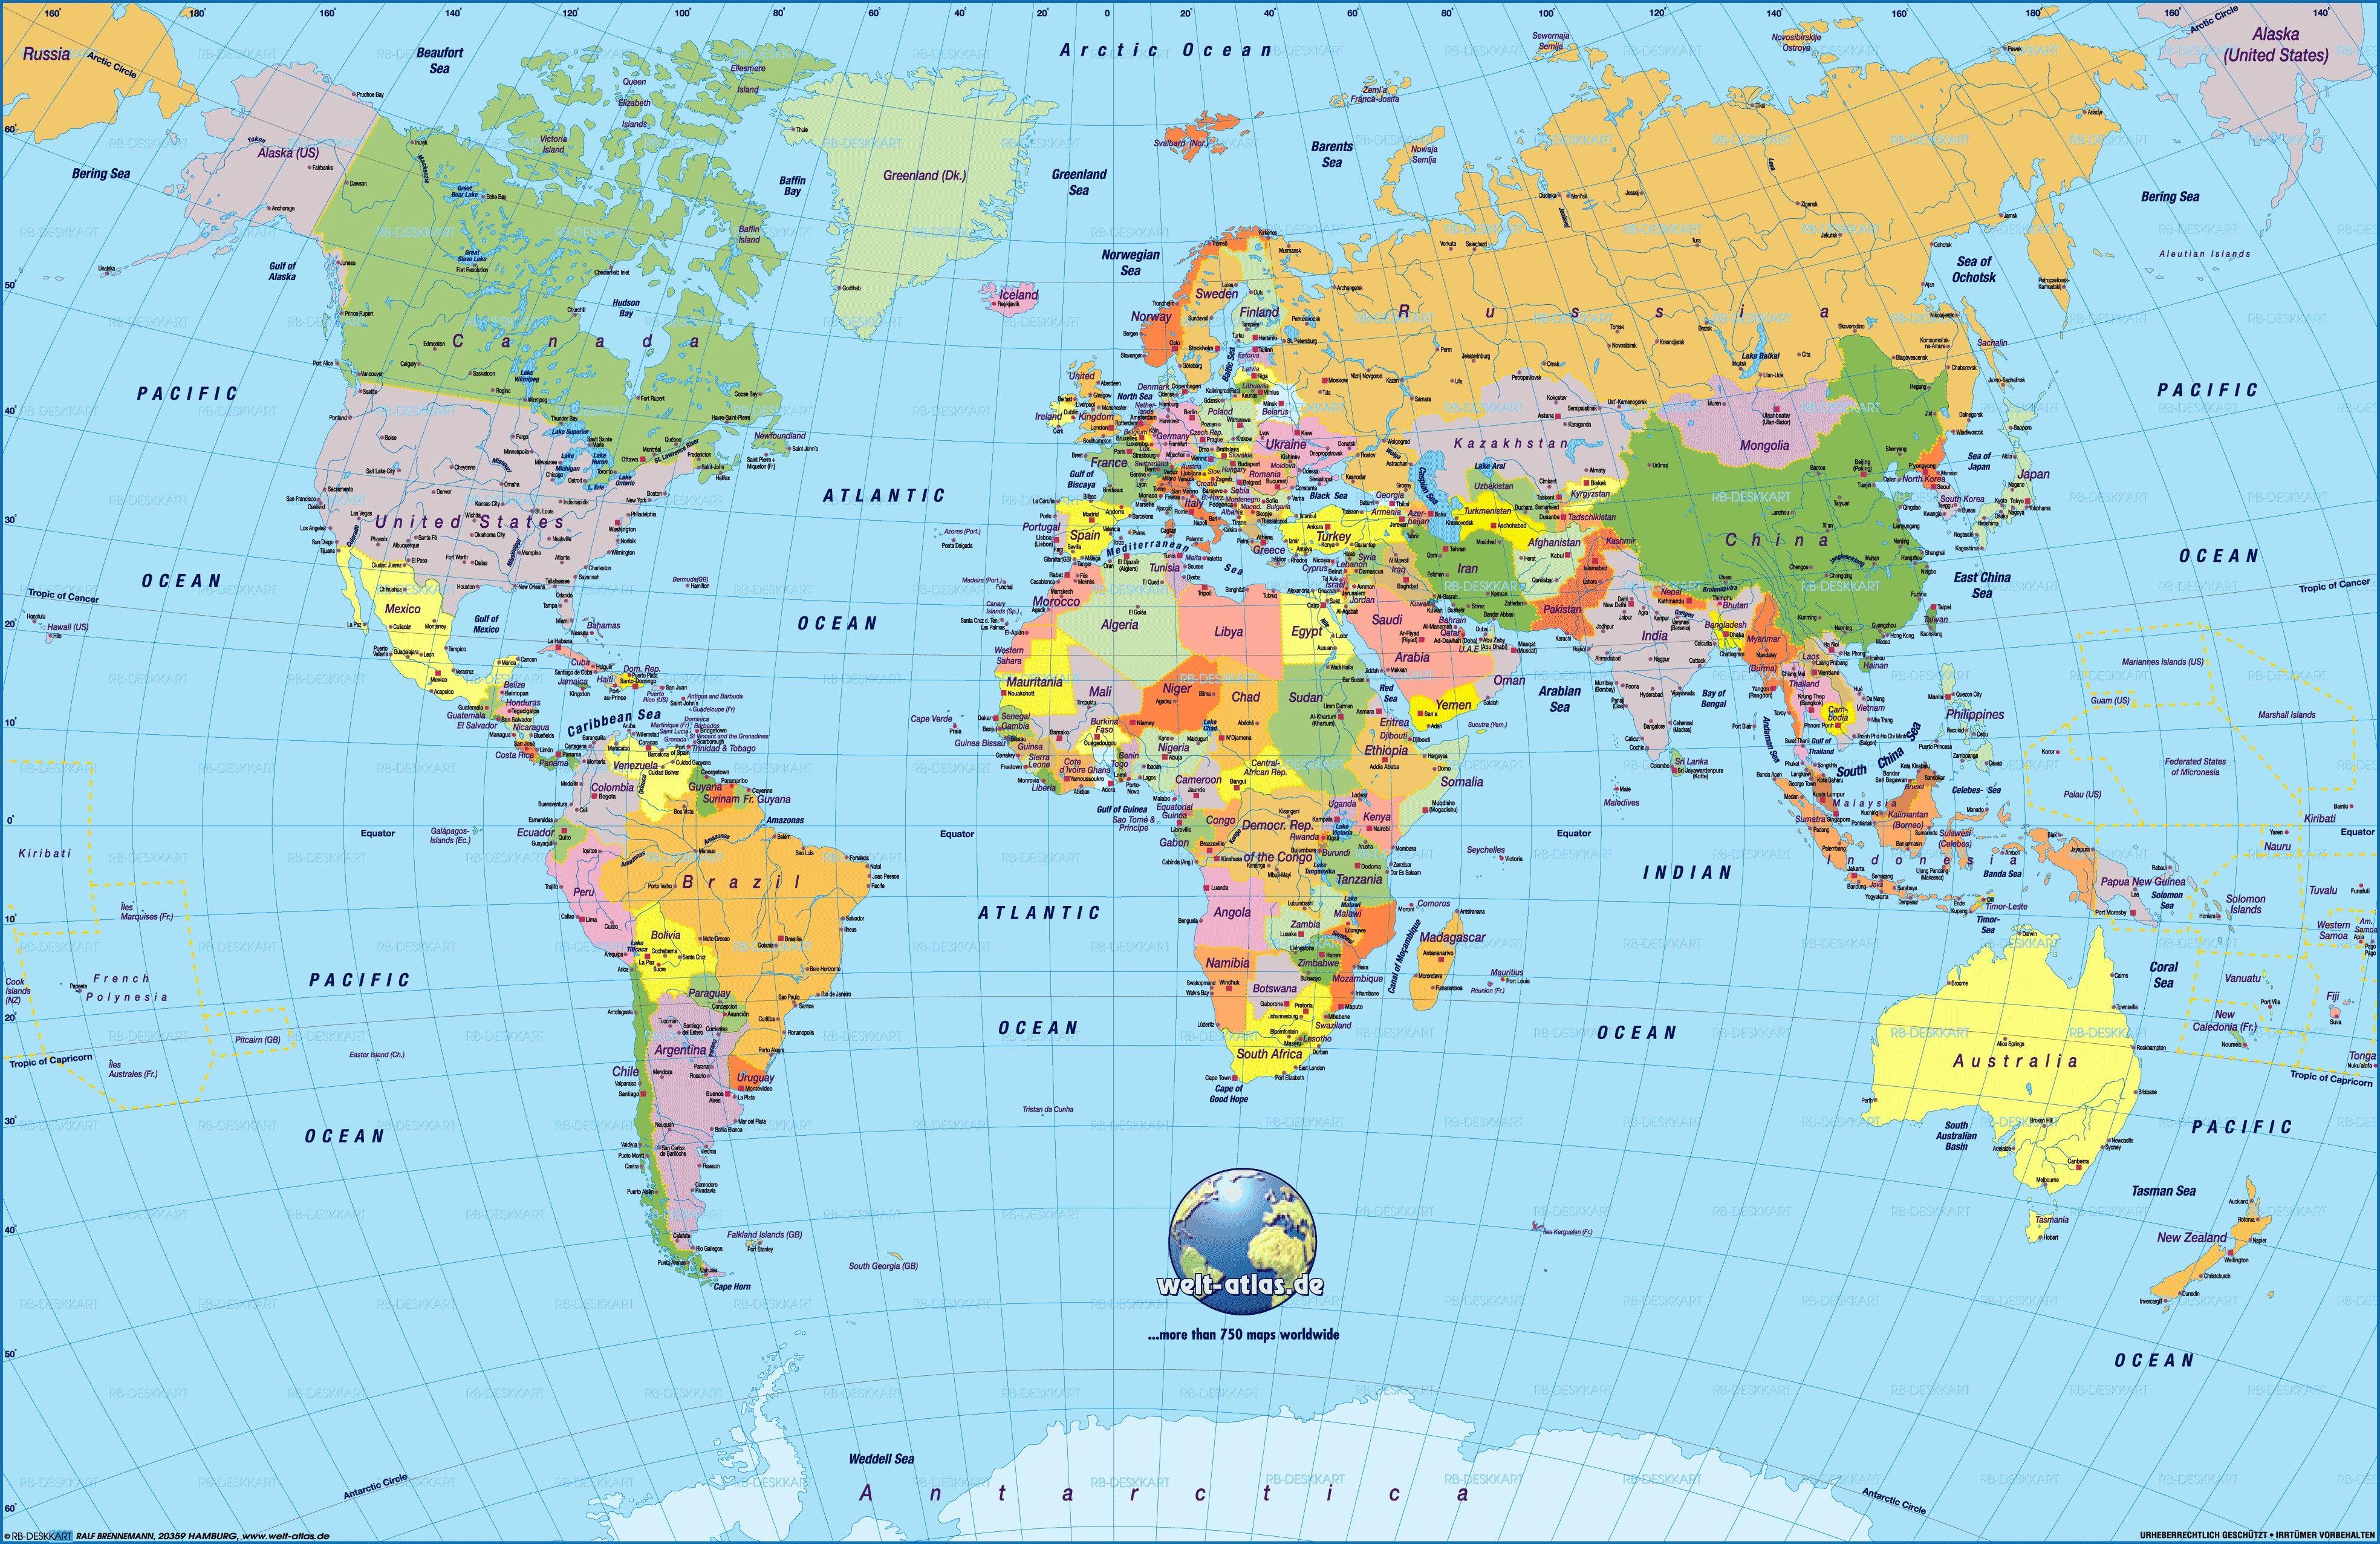 World Map Pdf Printable Archives 7Bit Co Best Hd On And | America - Free Printable World Map Pdf